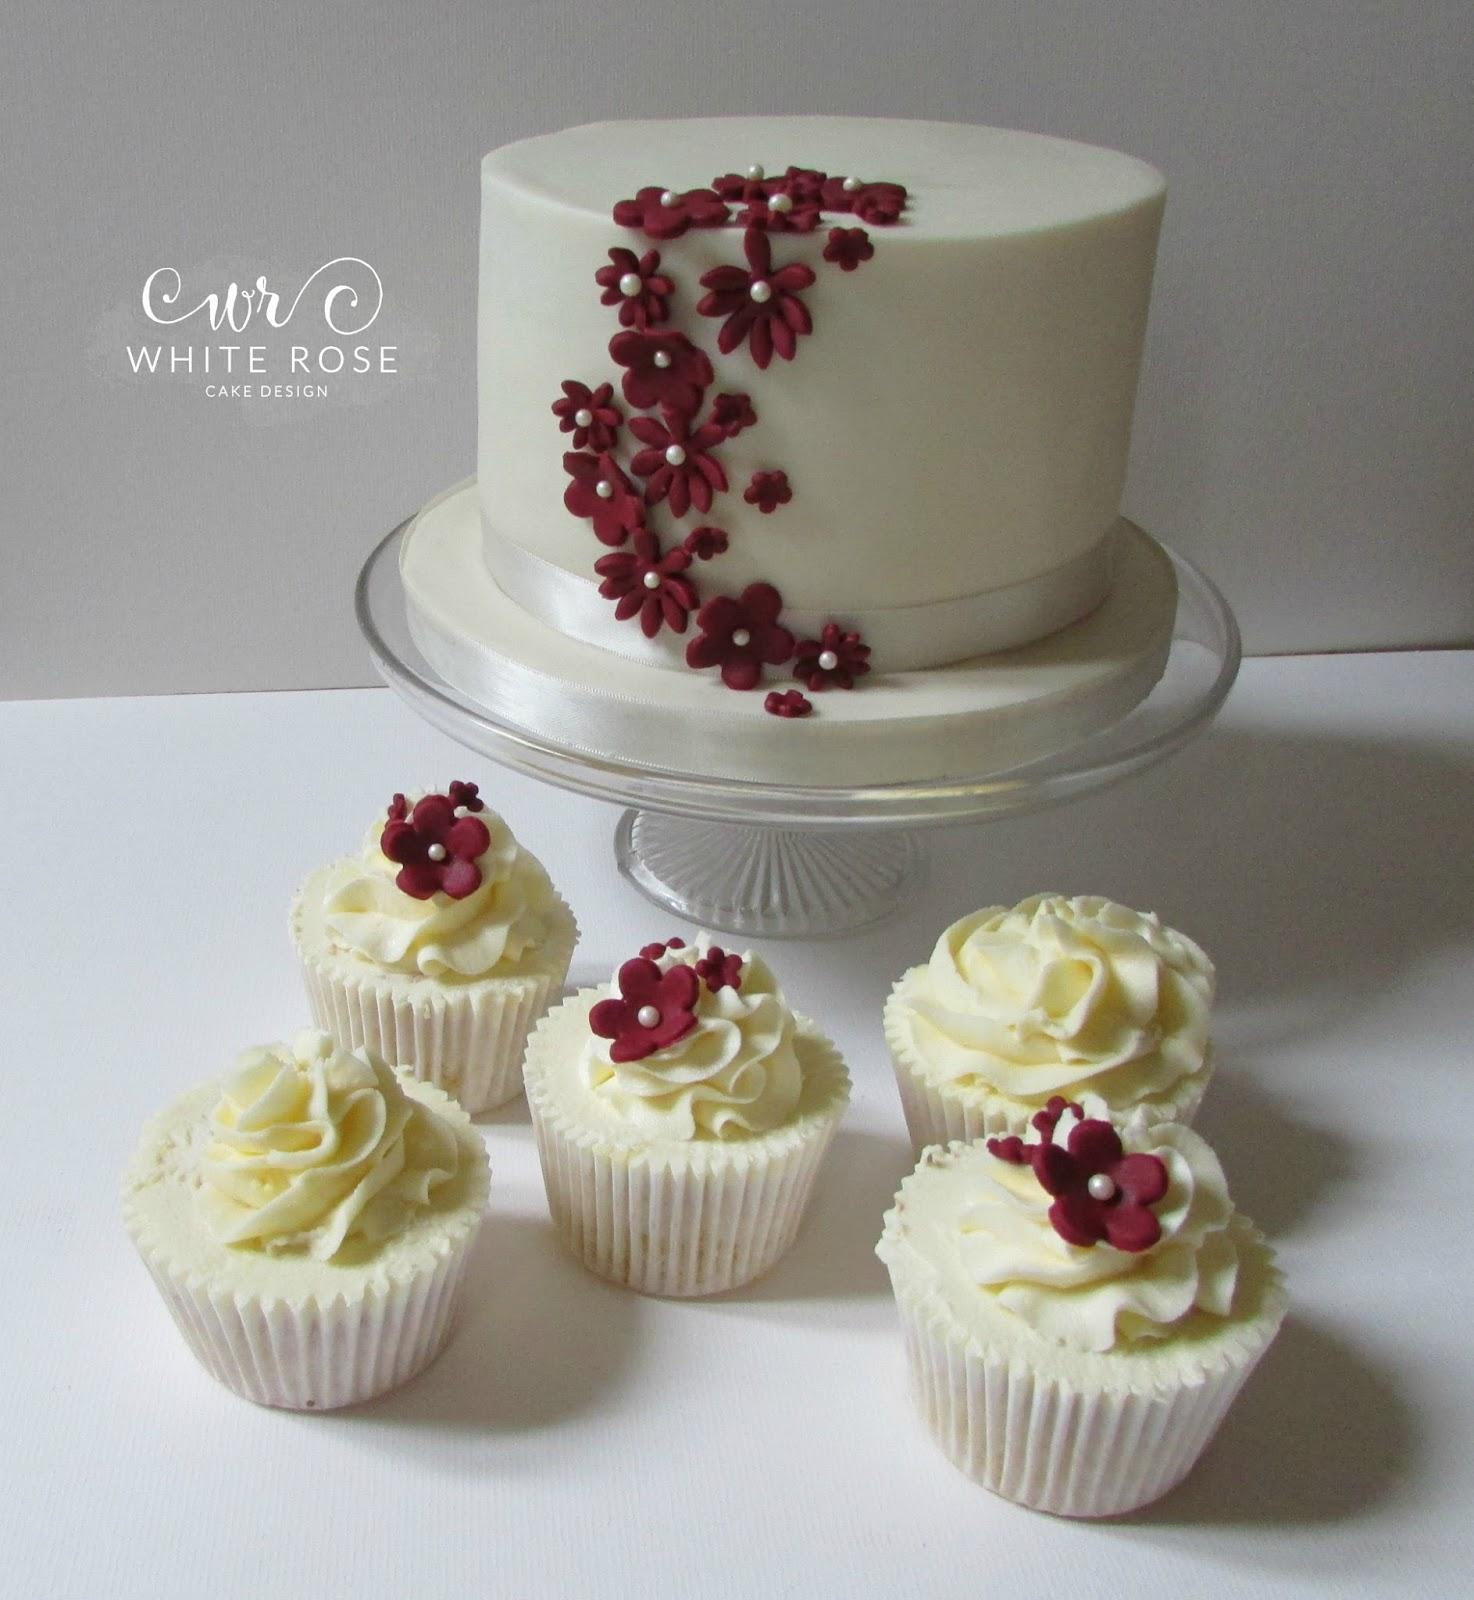 Marsala Blossom Cupcakes for a Wedding - White Rose Cake Design